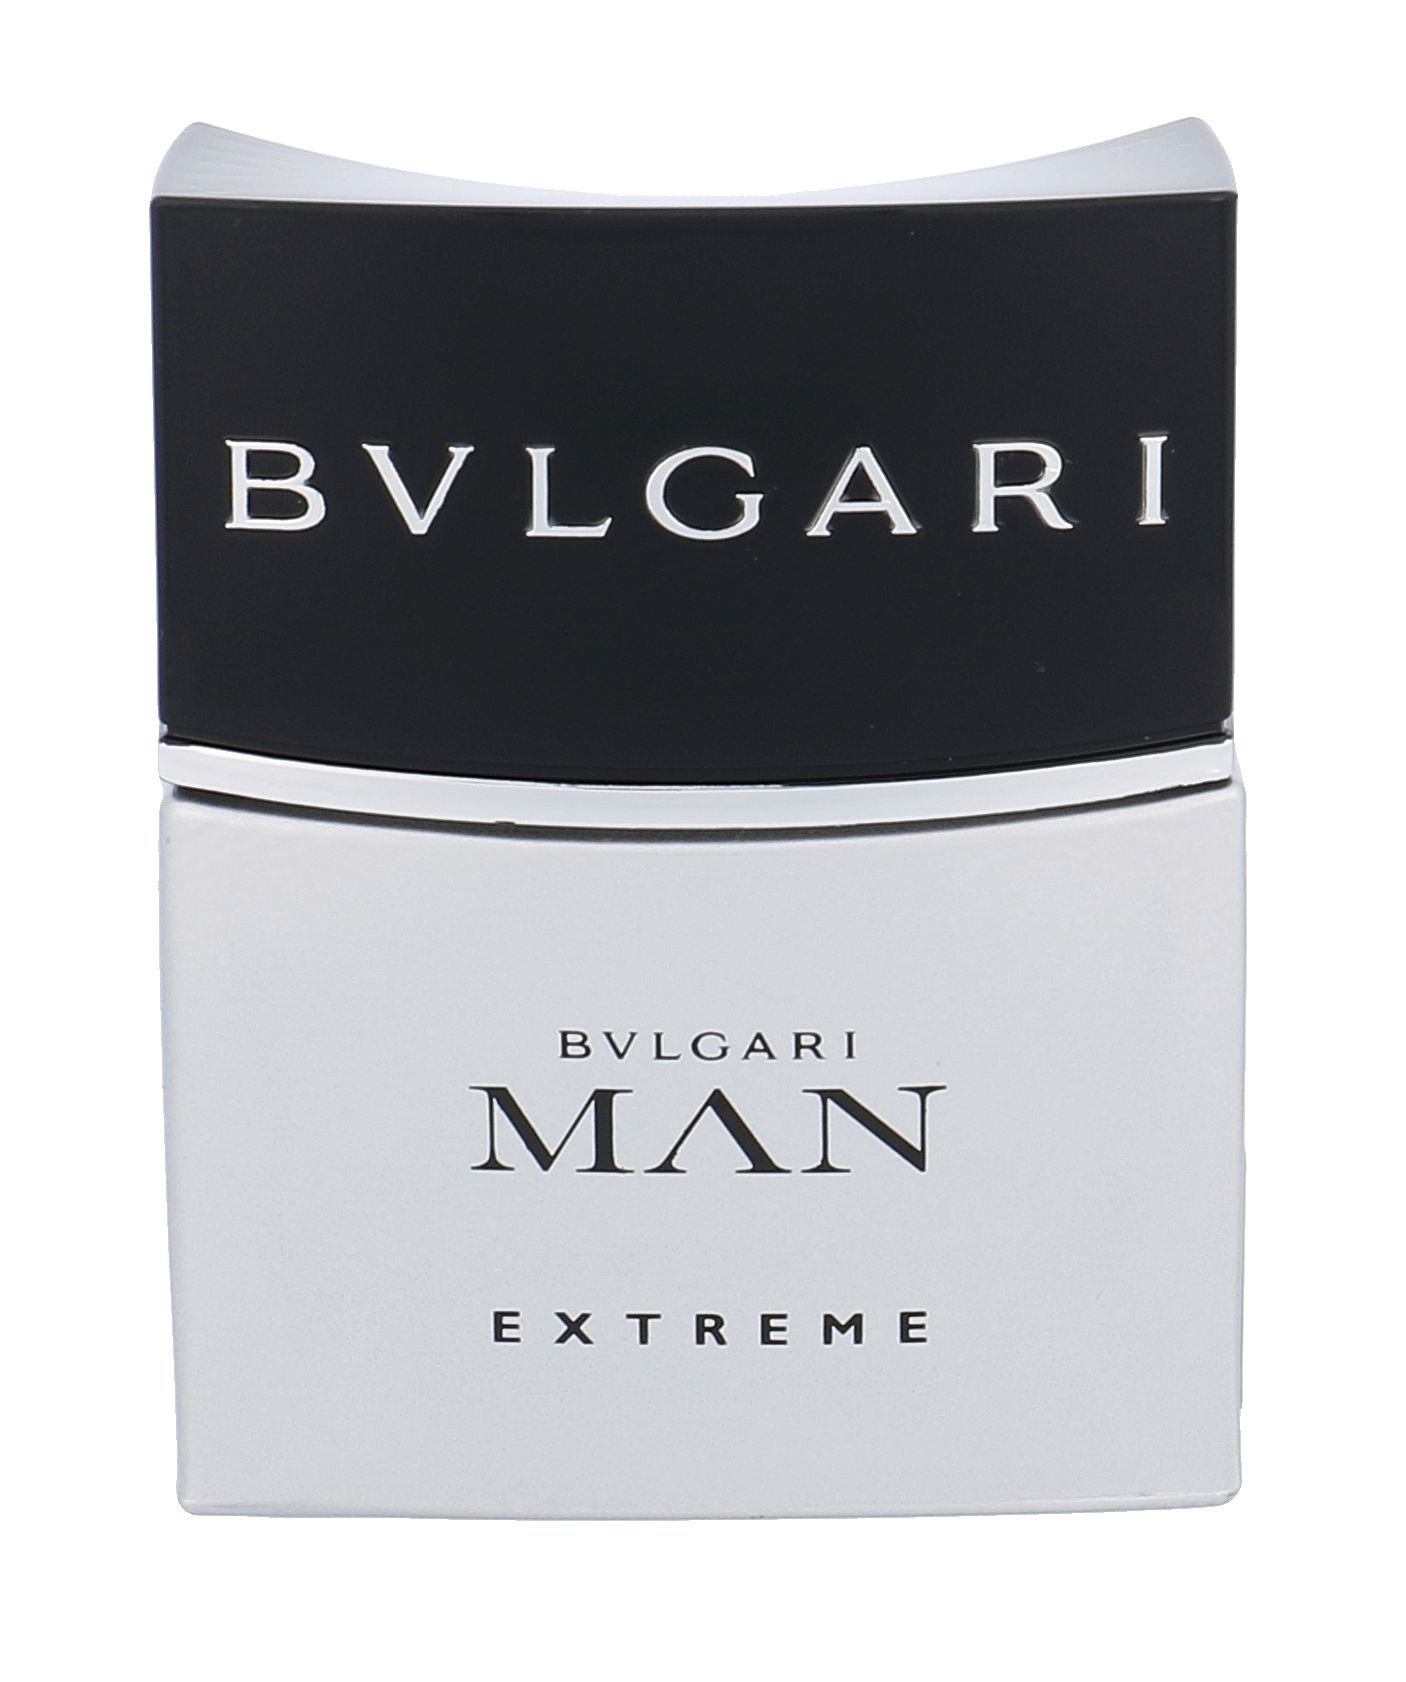 Bvlgari Bvlgari Man Extreme EDT 30ml